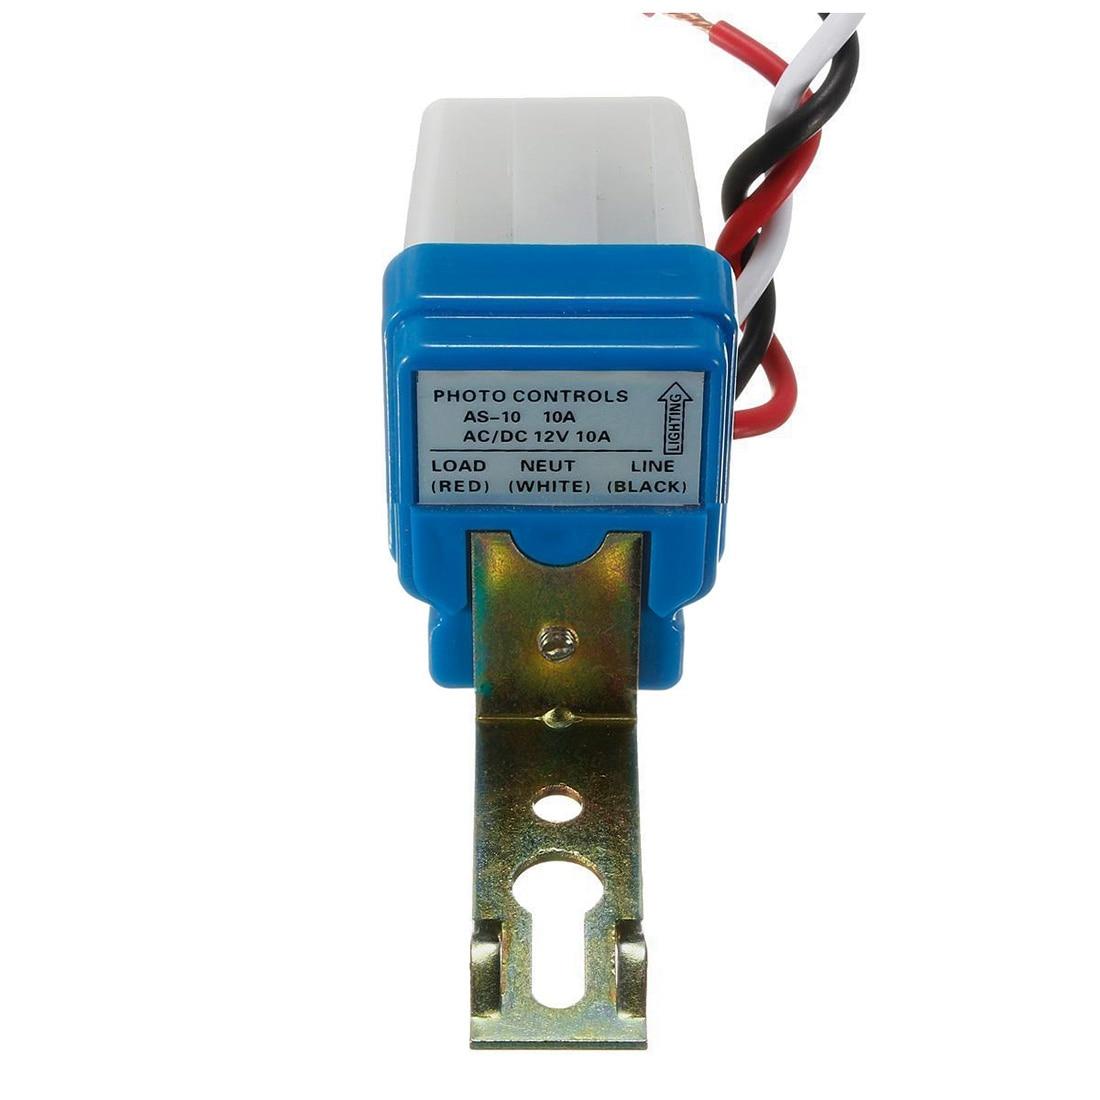 AC DC 12V 10A Automatic Lamp Twilight Switch Light Sensor Twilight Switch мультиметр uyigao ac dc ua18